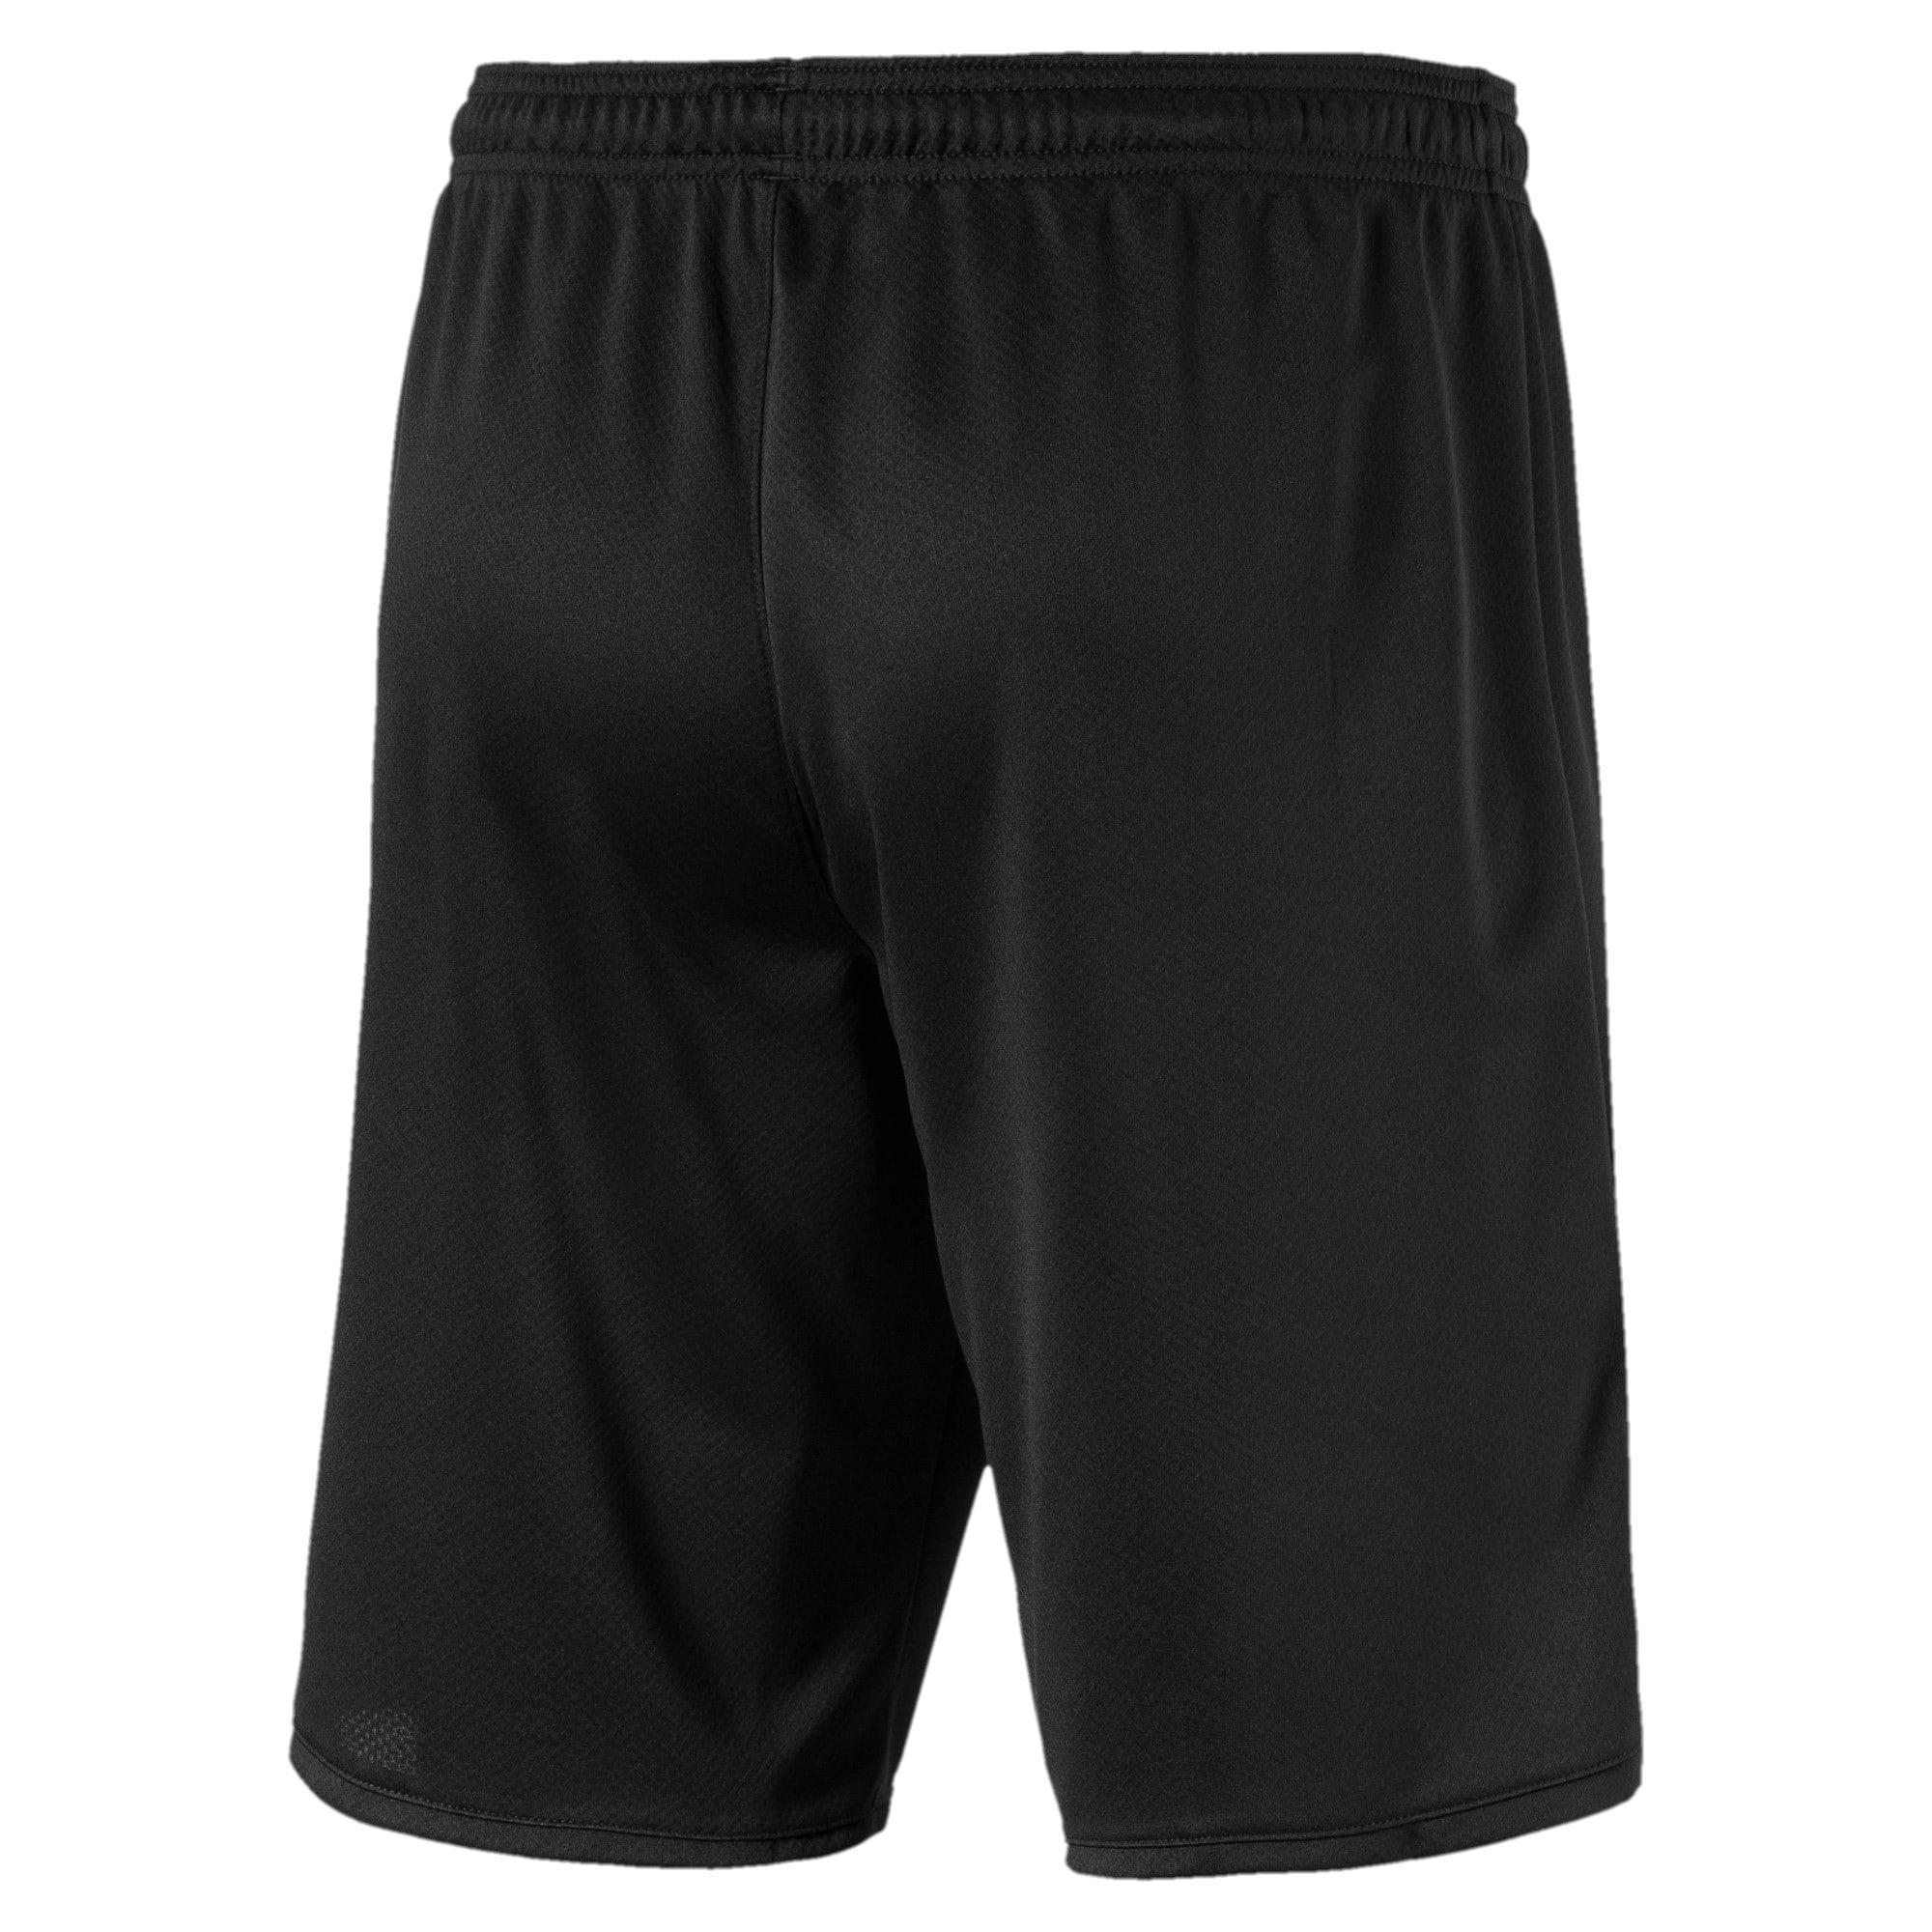 Thumbnail 2 of Manchester City Men's Third Replica Shorts, Puma Black-Georgia Peach, medium